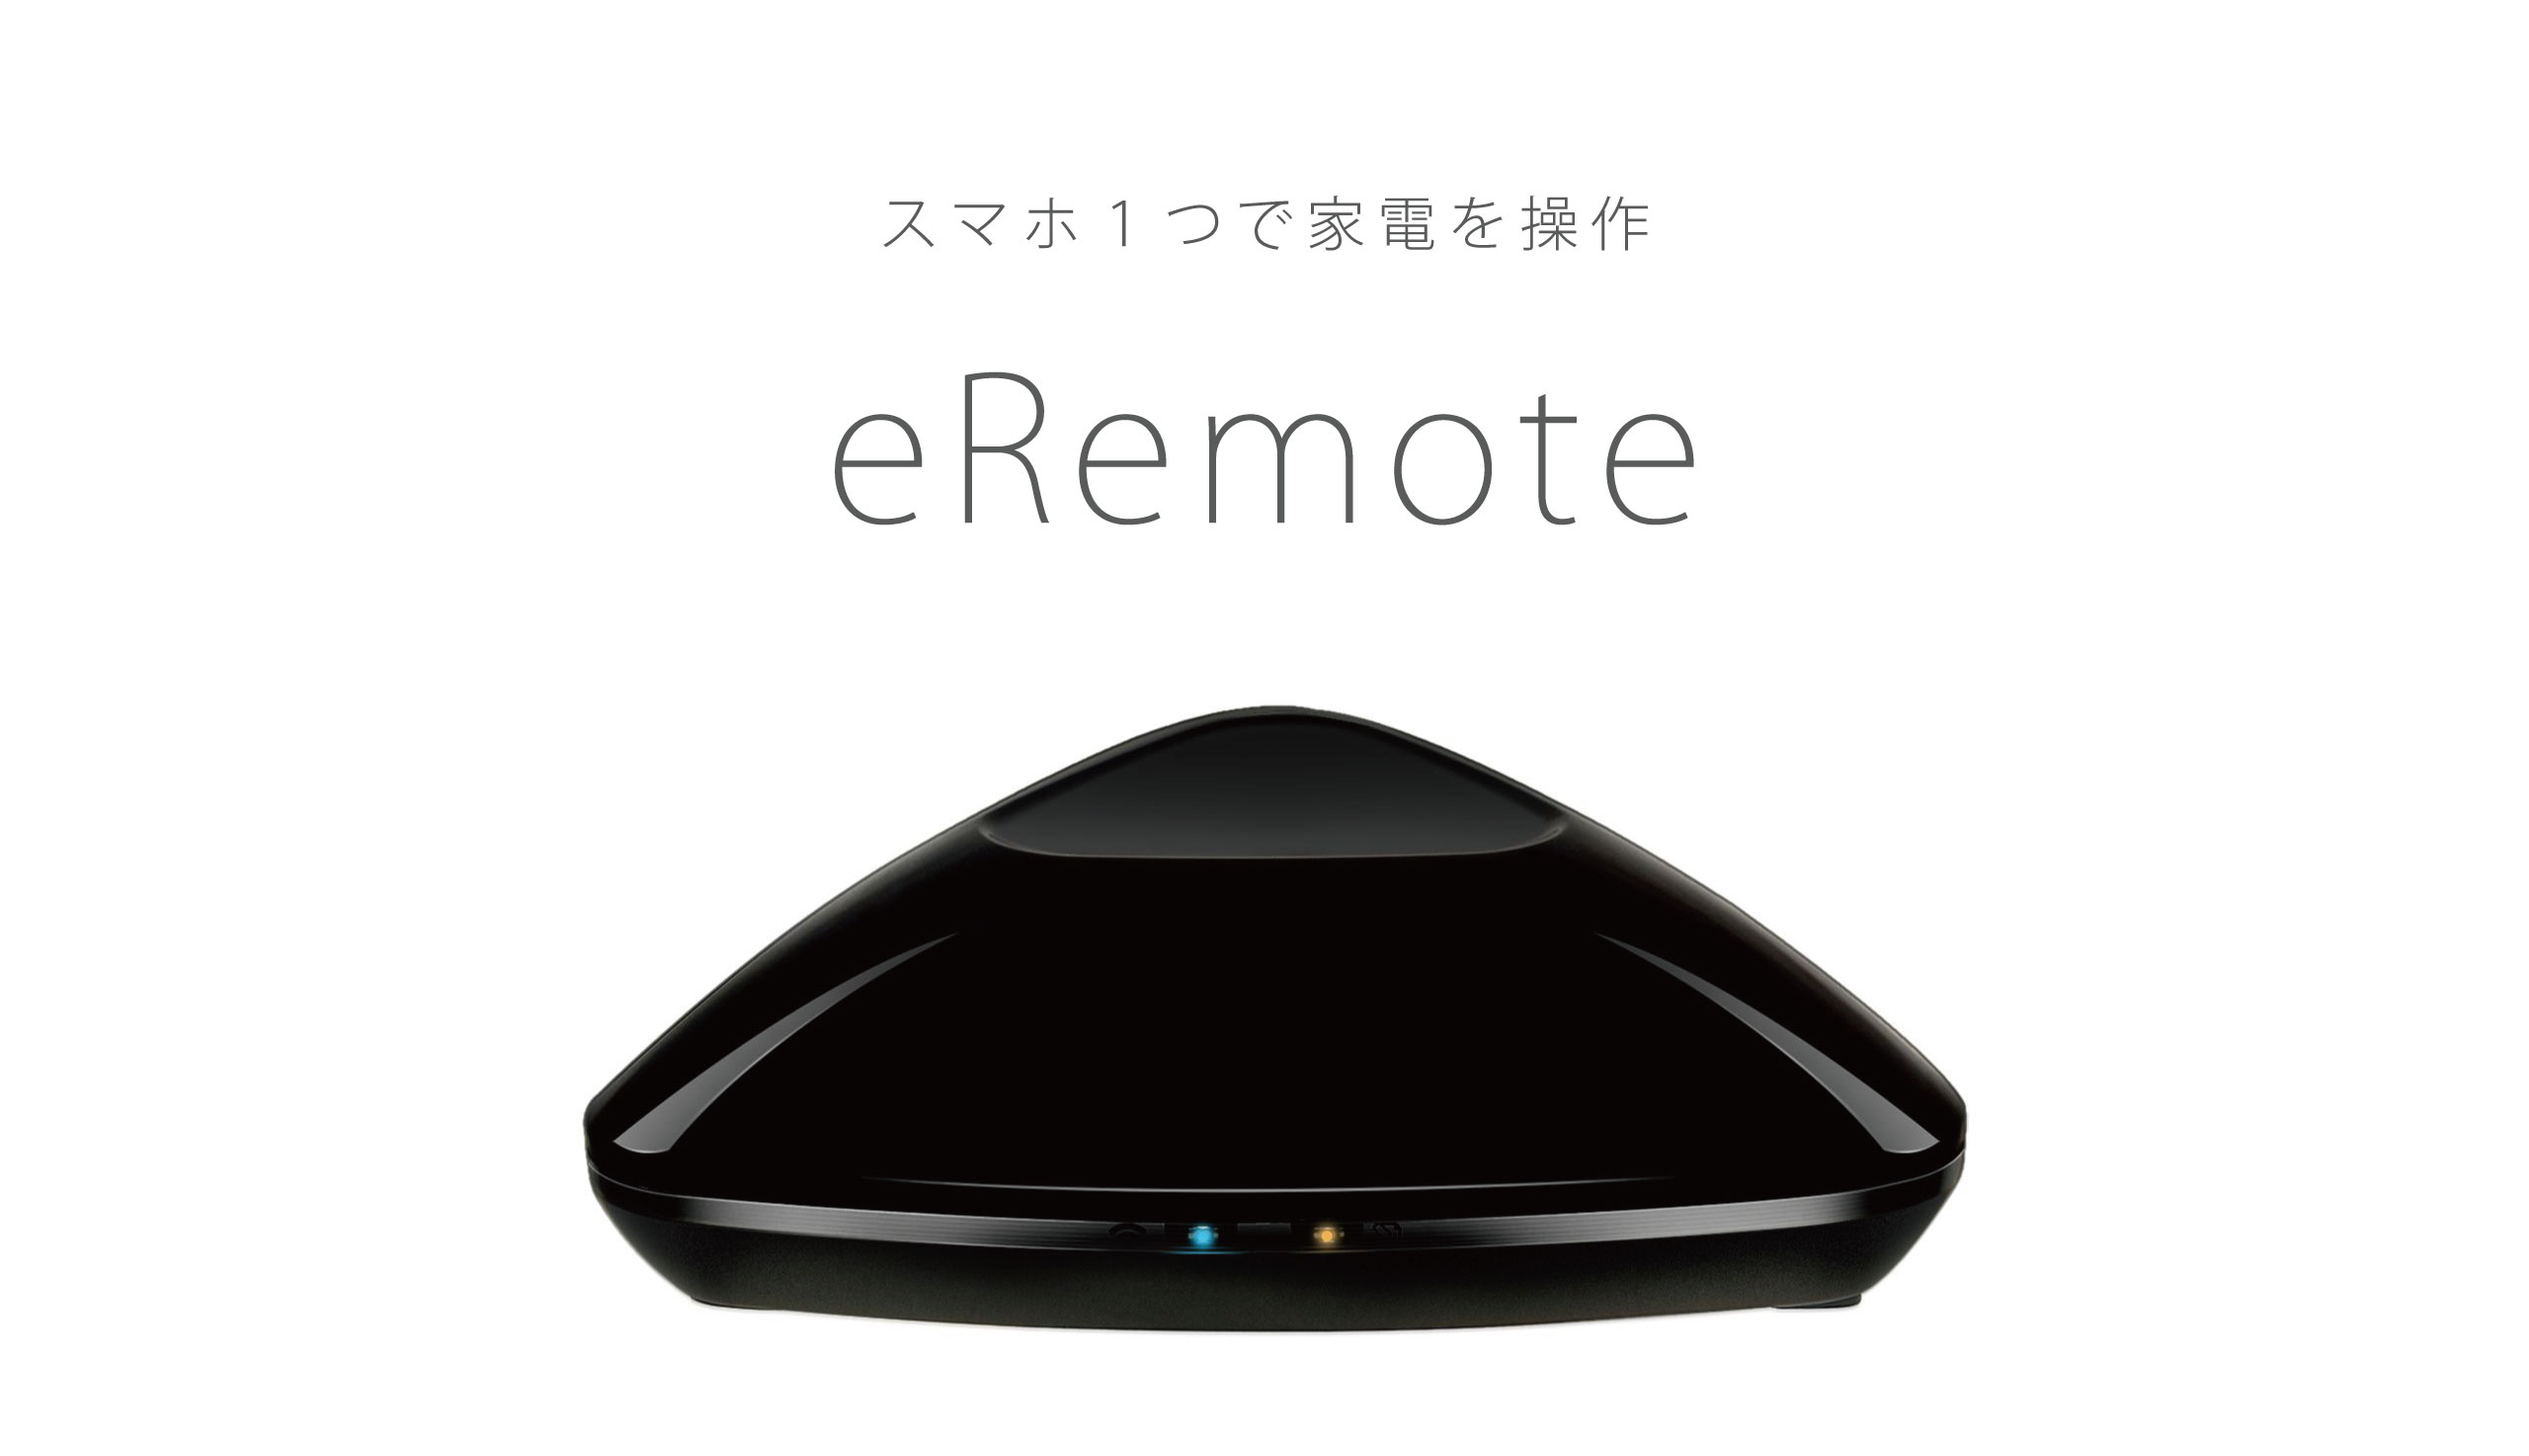 eRemote|IoT 家電 スマートホーム・スマートハウス|Link Japanメイン画像